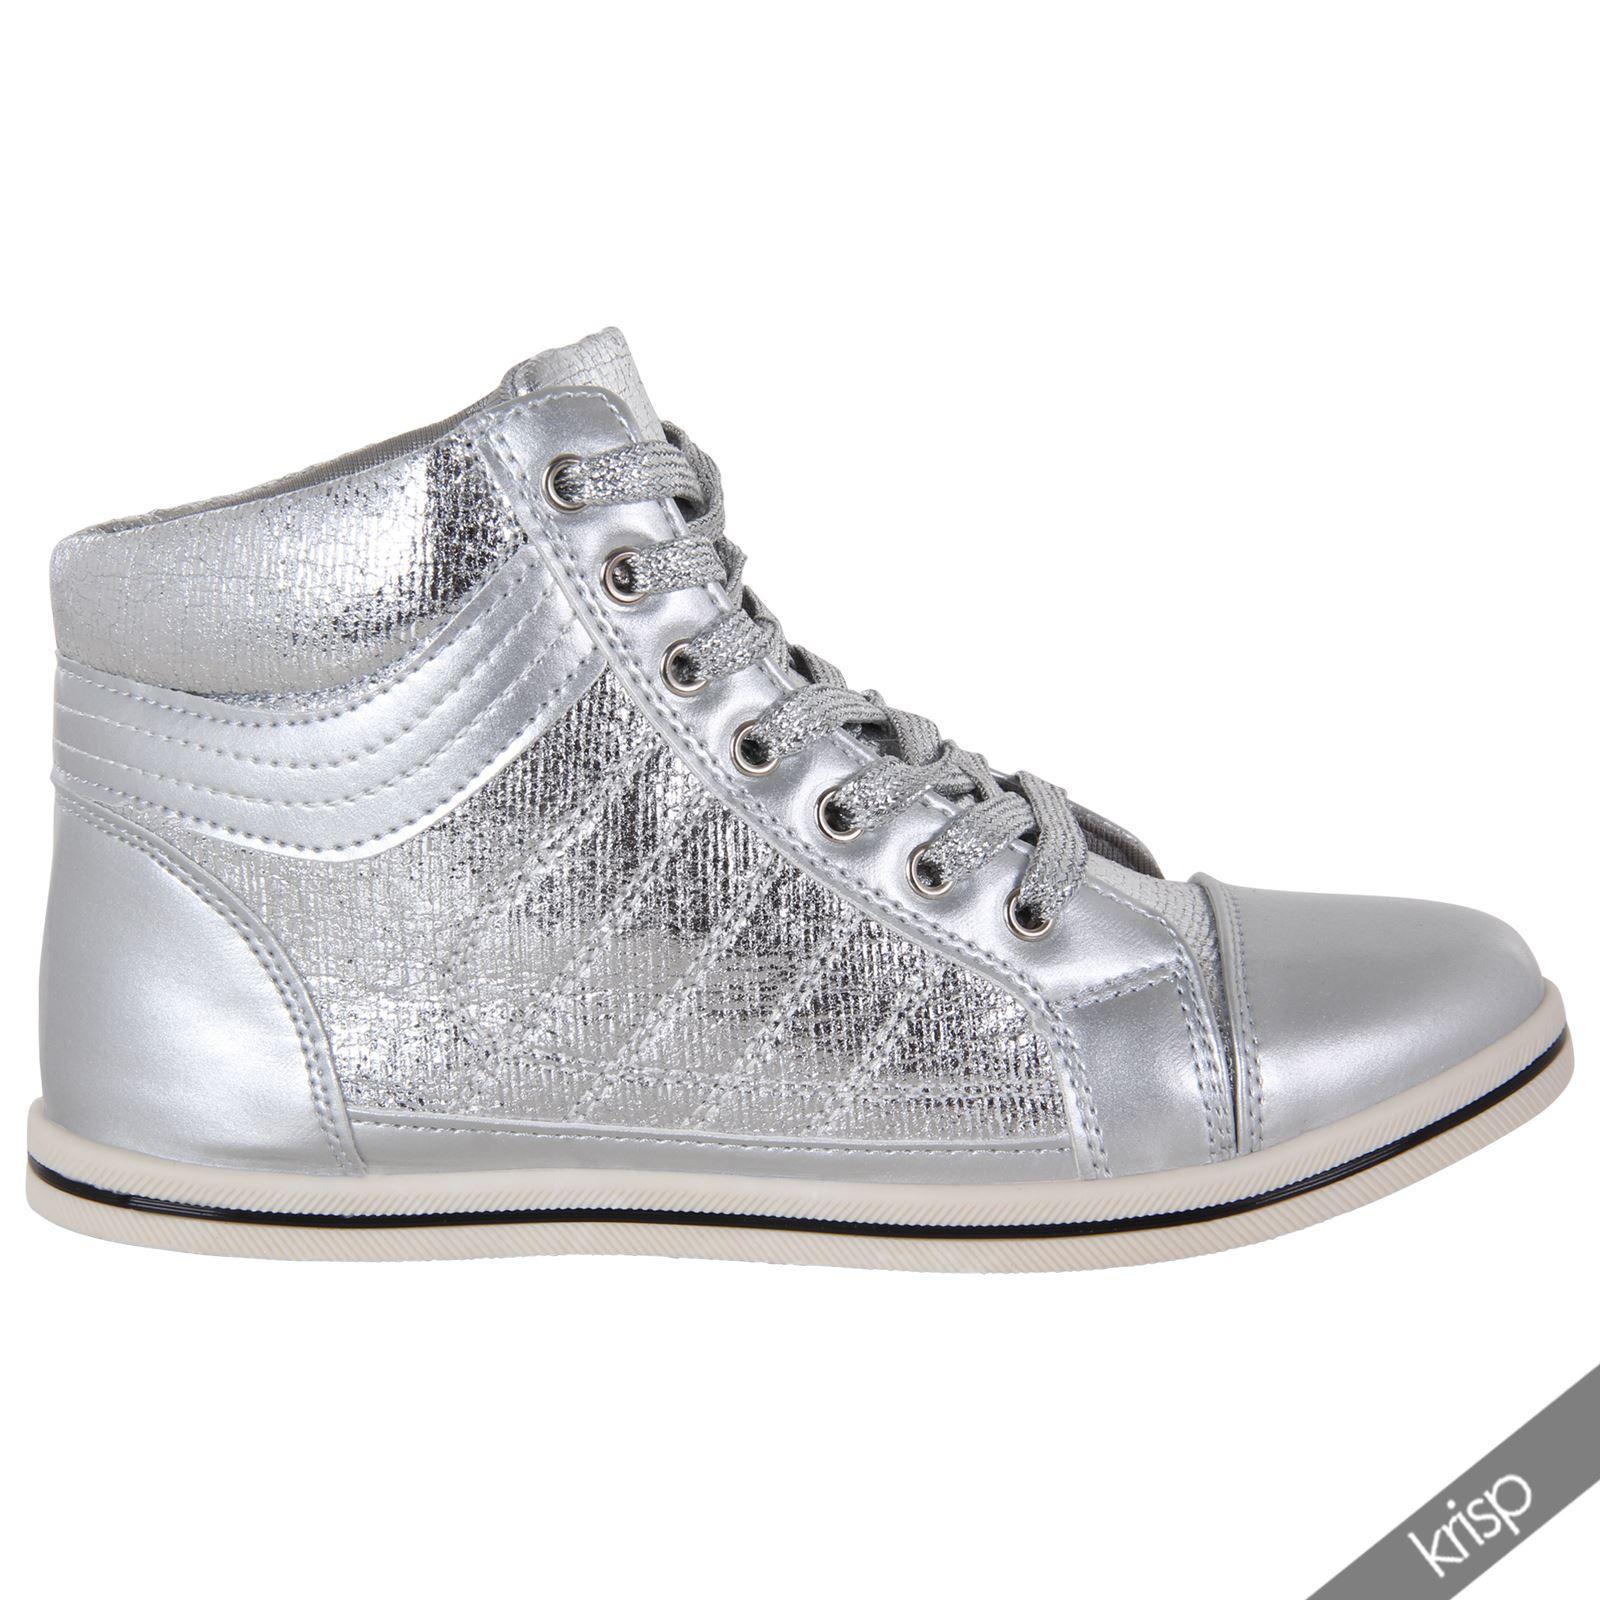 TOP Freizeitschuhe Damenschuhe Sneaker Sportschuhe 5996 Schwarz Silber 38